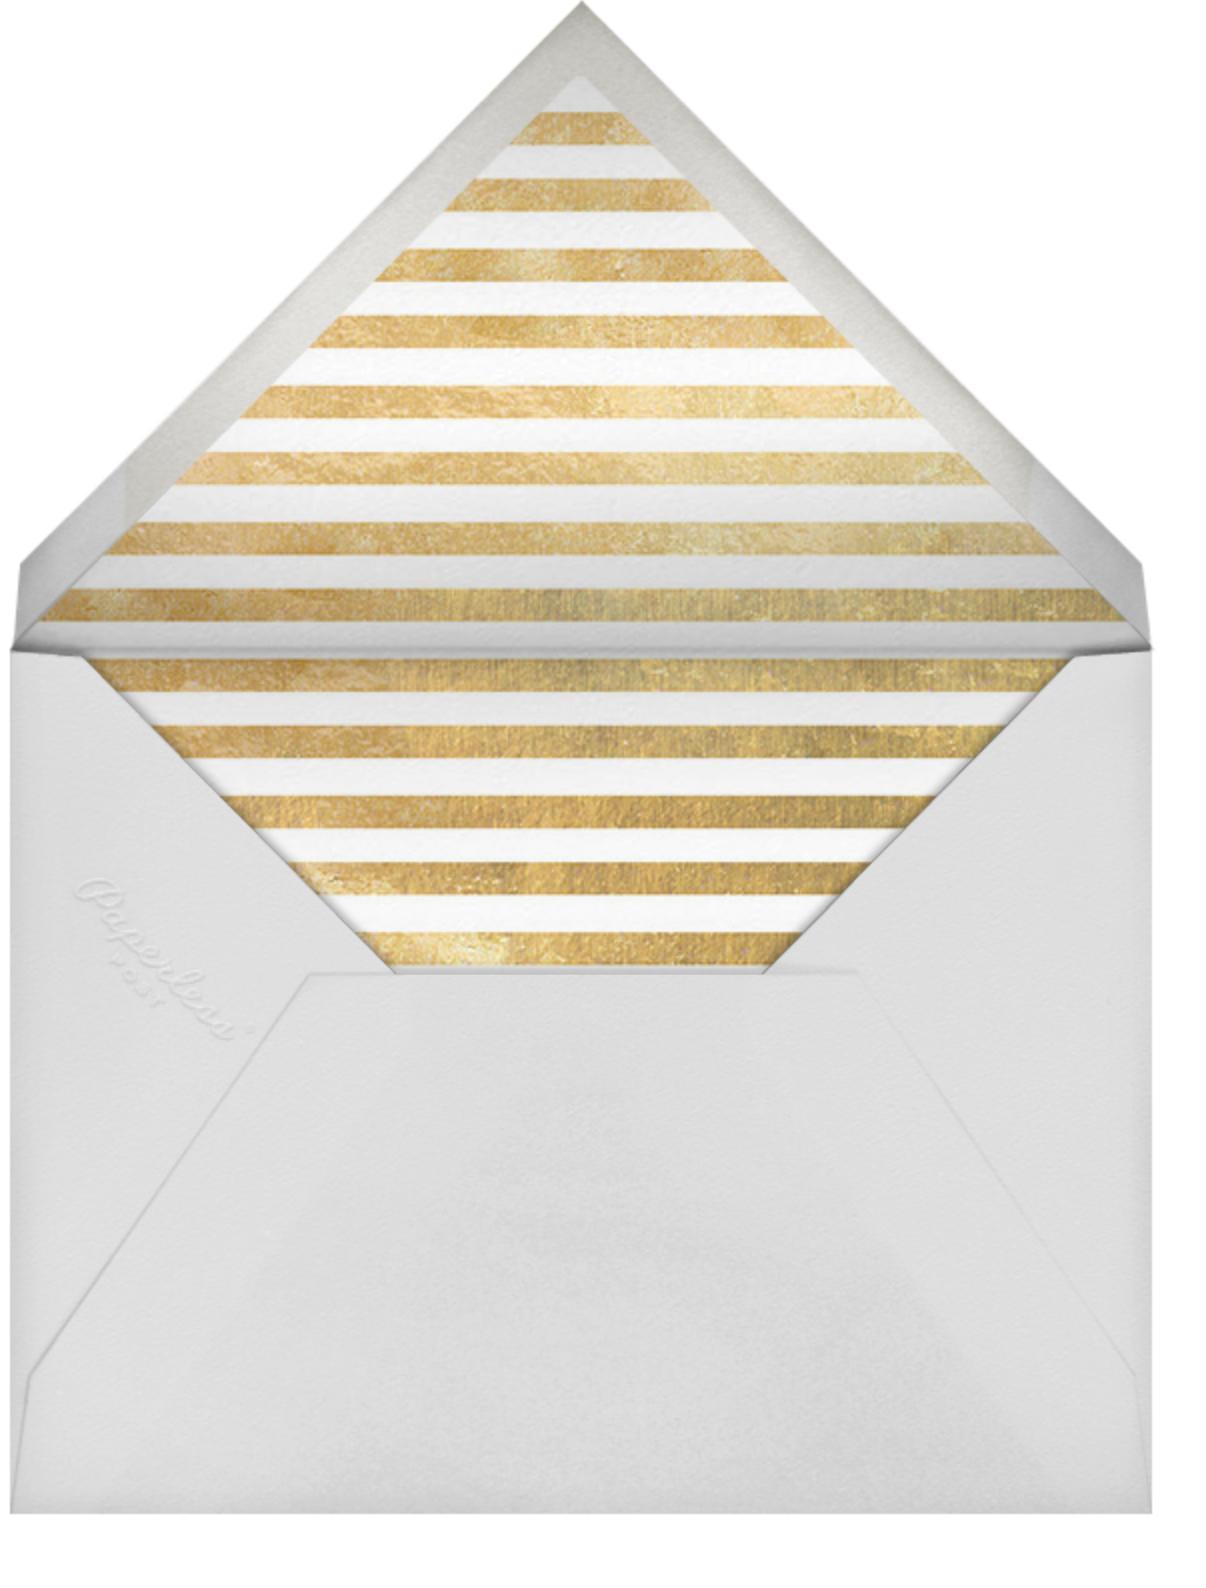 Pop Fizz Clink! (Horizontal) - kate spade new york - Envelope